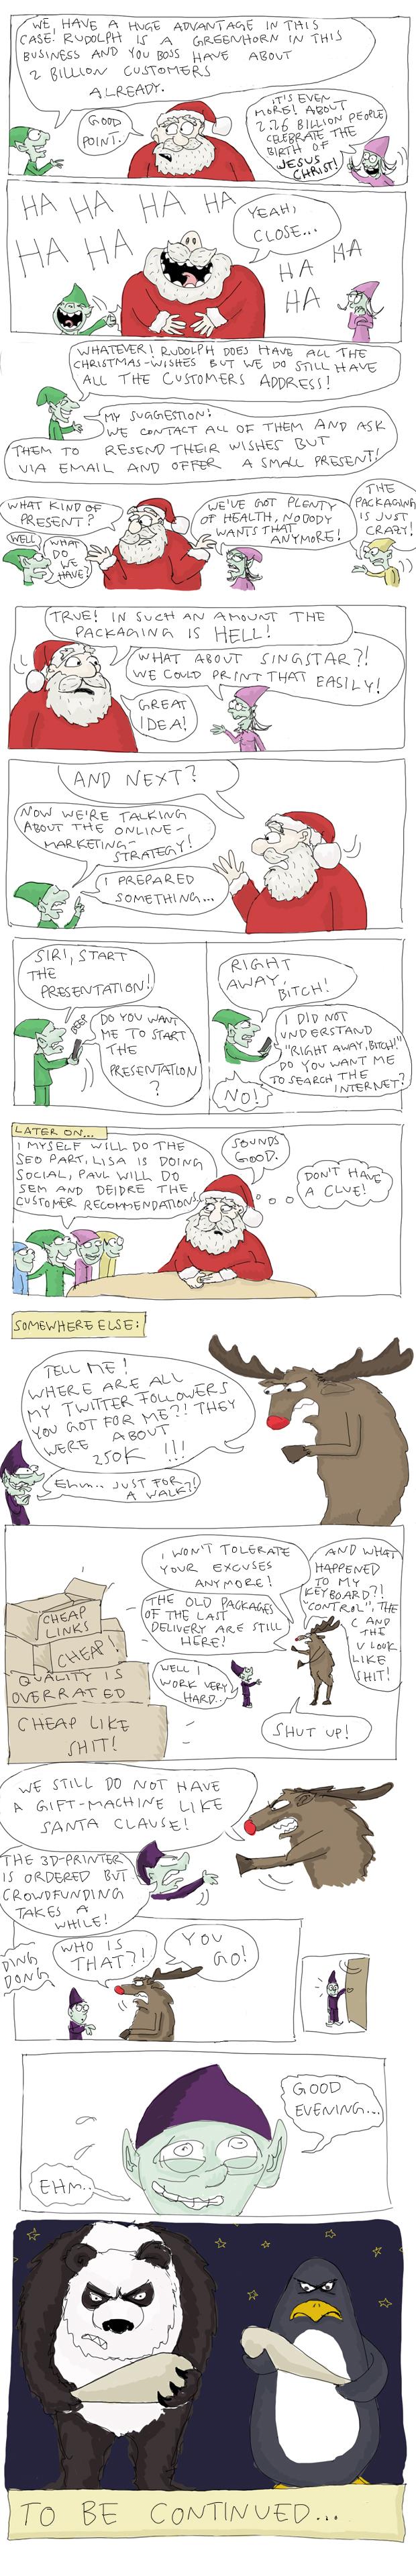 Santa and the Googlebots by Tobias Kerstin